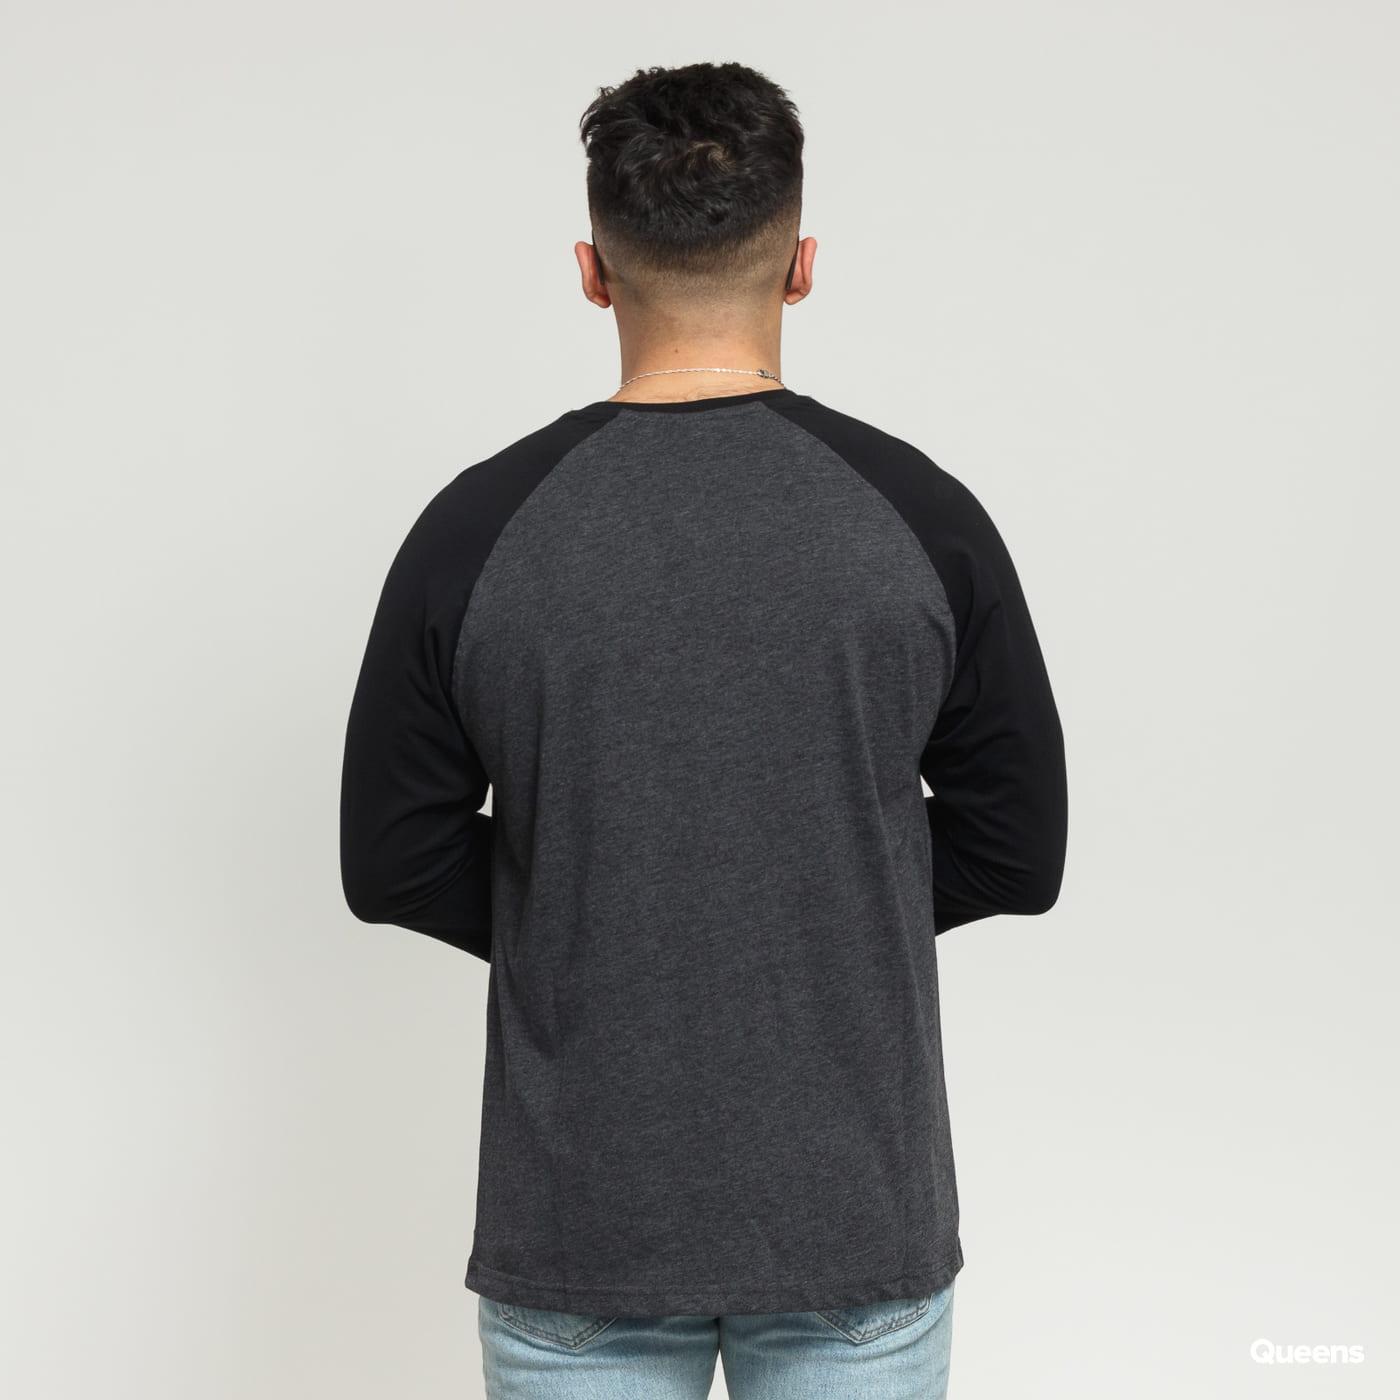 Urban Classics Contrast 3/4 Sleeve Raglan dark gray / black